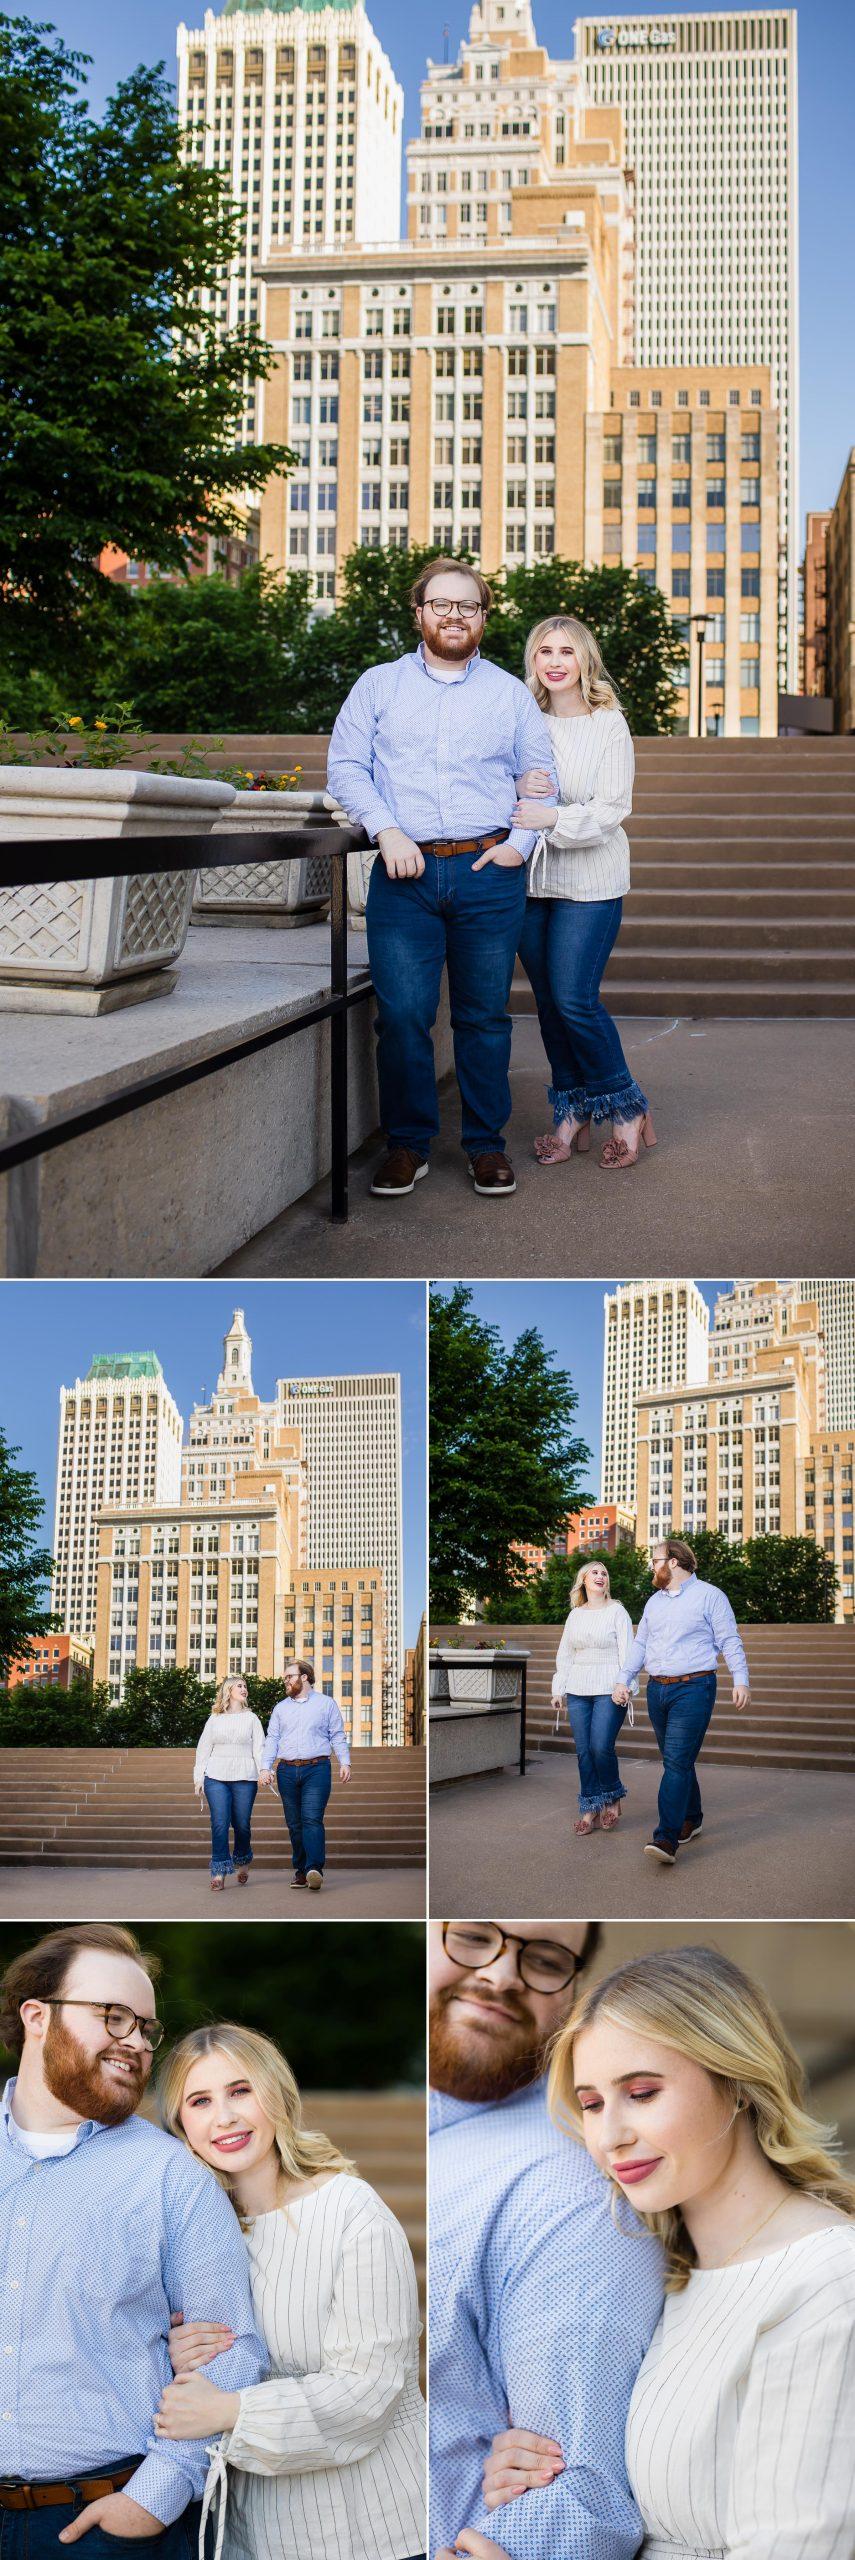 Downtown Tulsa Engagement